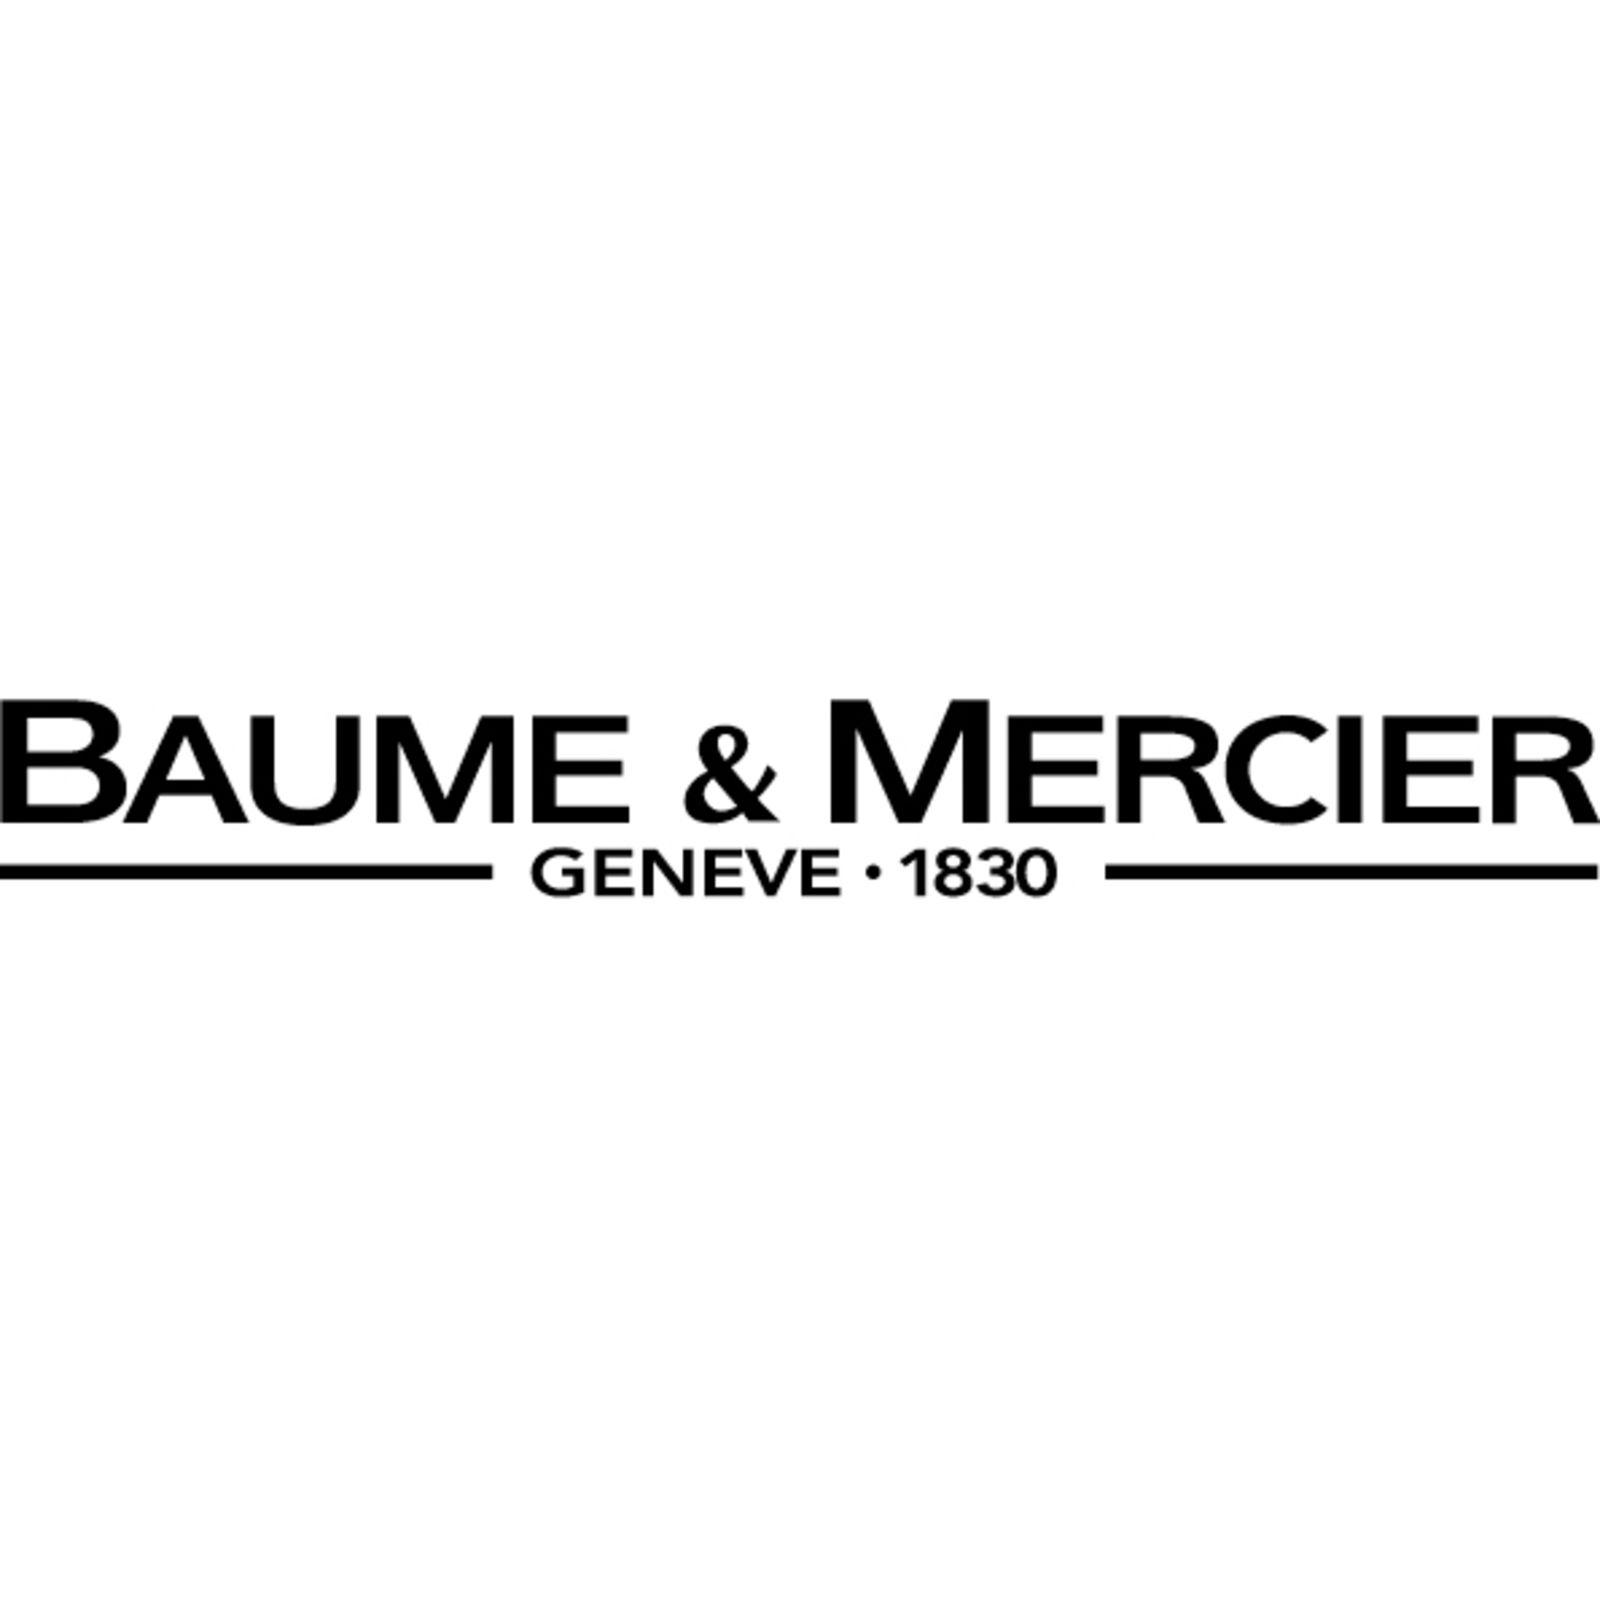 BAUME & MERCIER (Bild 1)